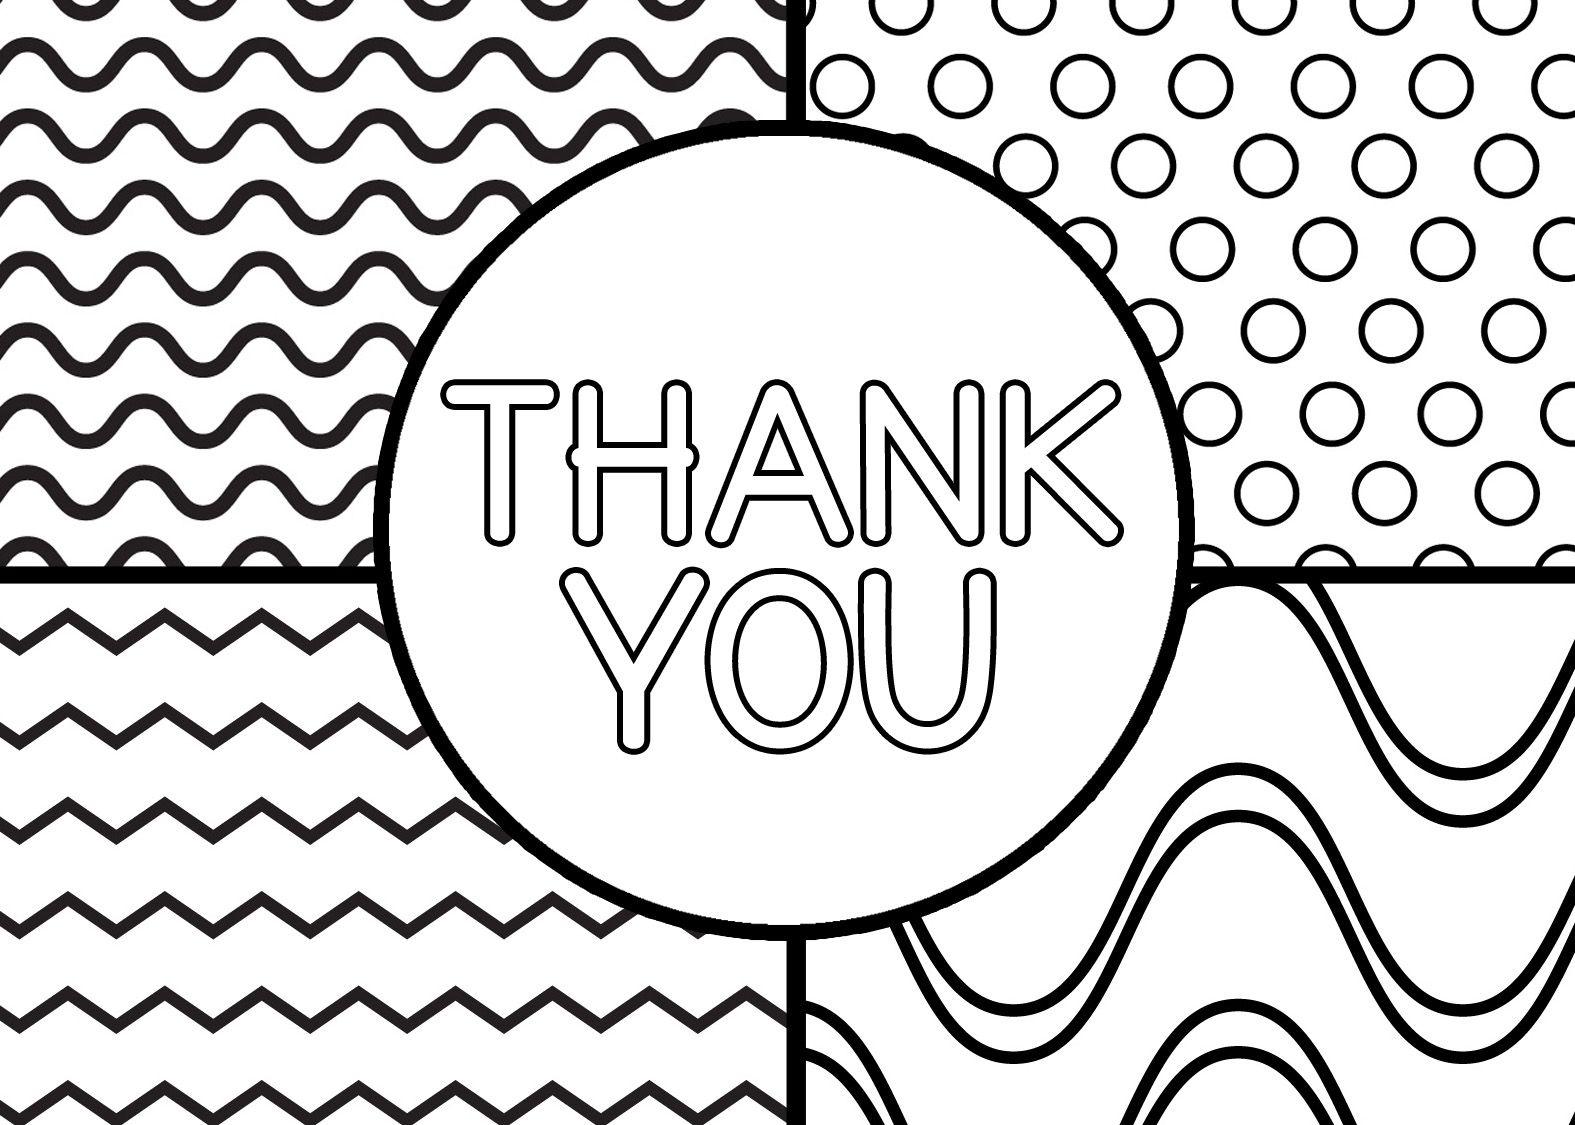 012 Printable Thank You Card Templates Template ~ Ulyssesroom - Free Printable Thank You Cards Black And White